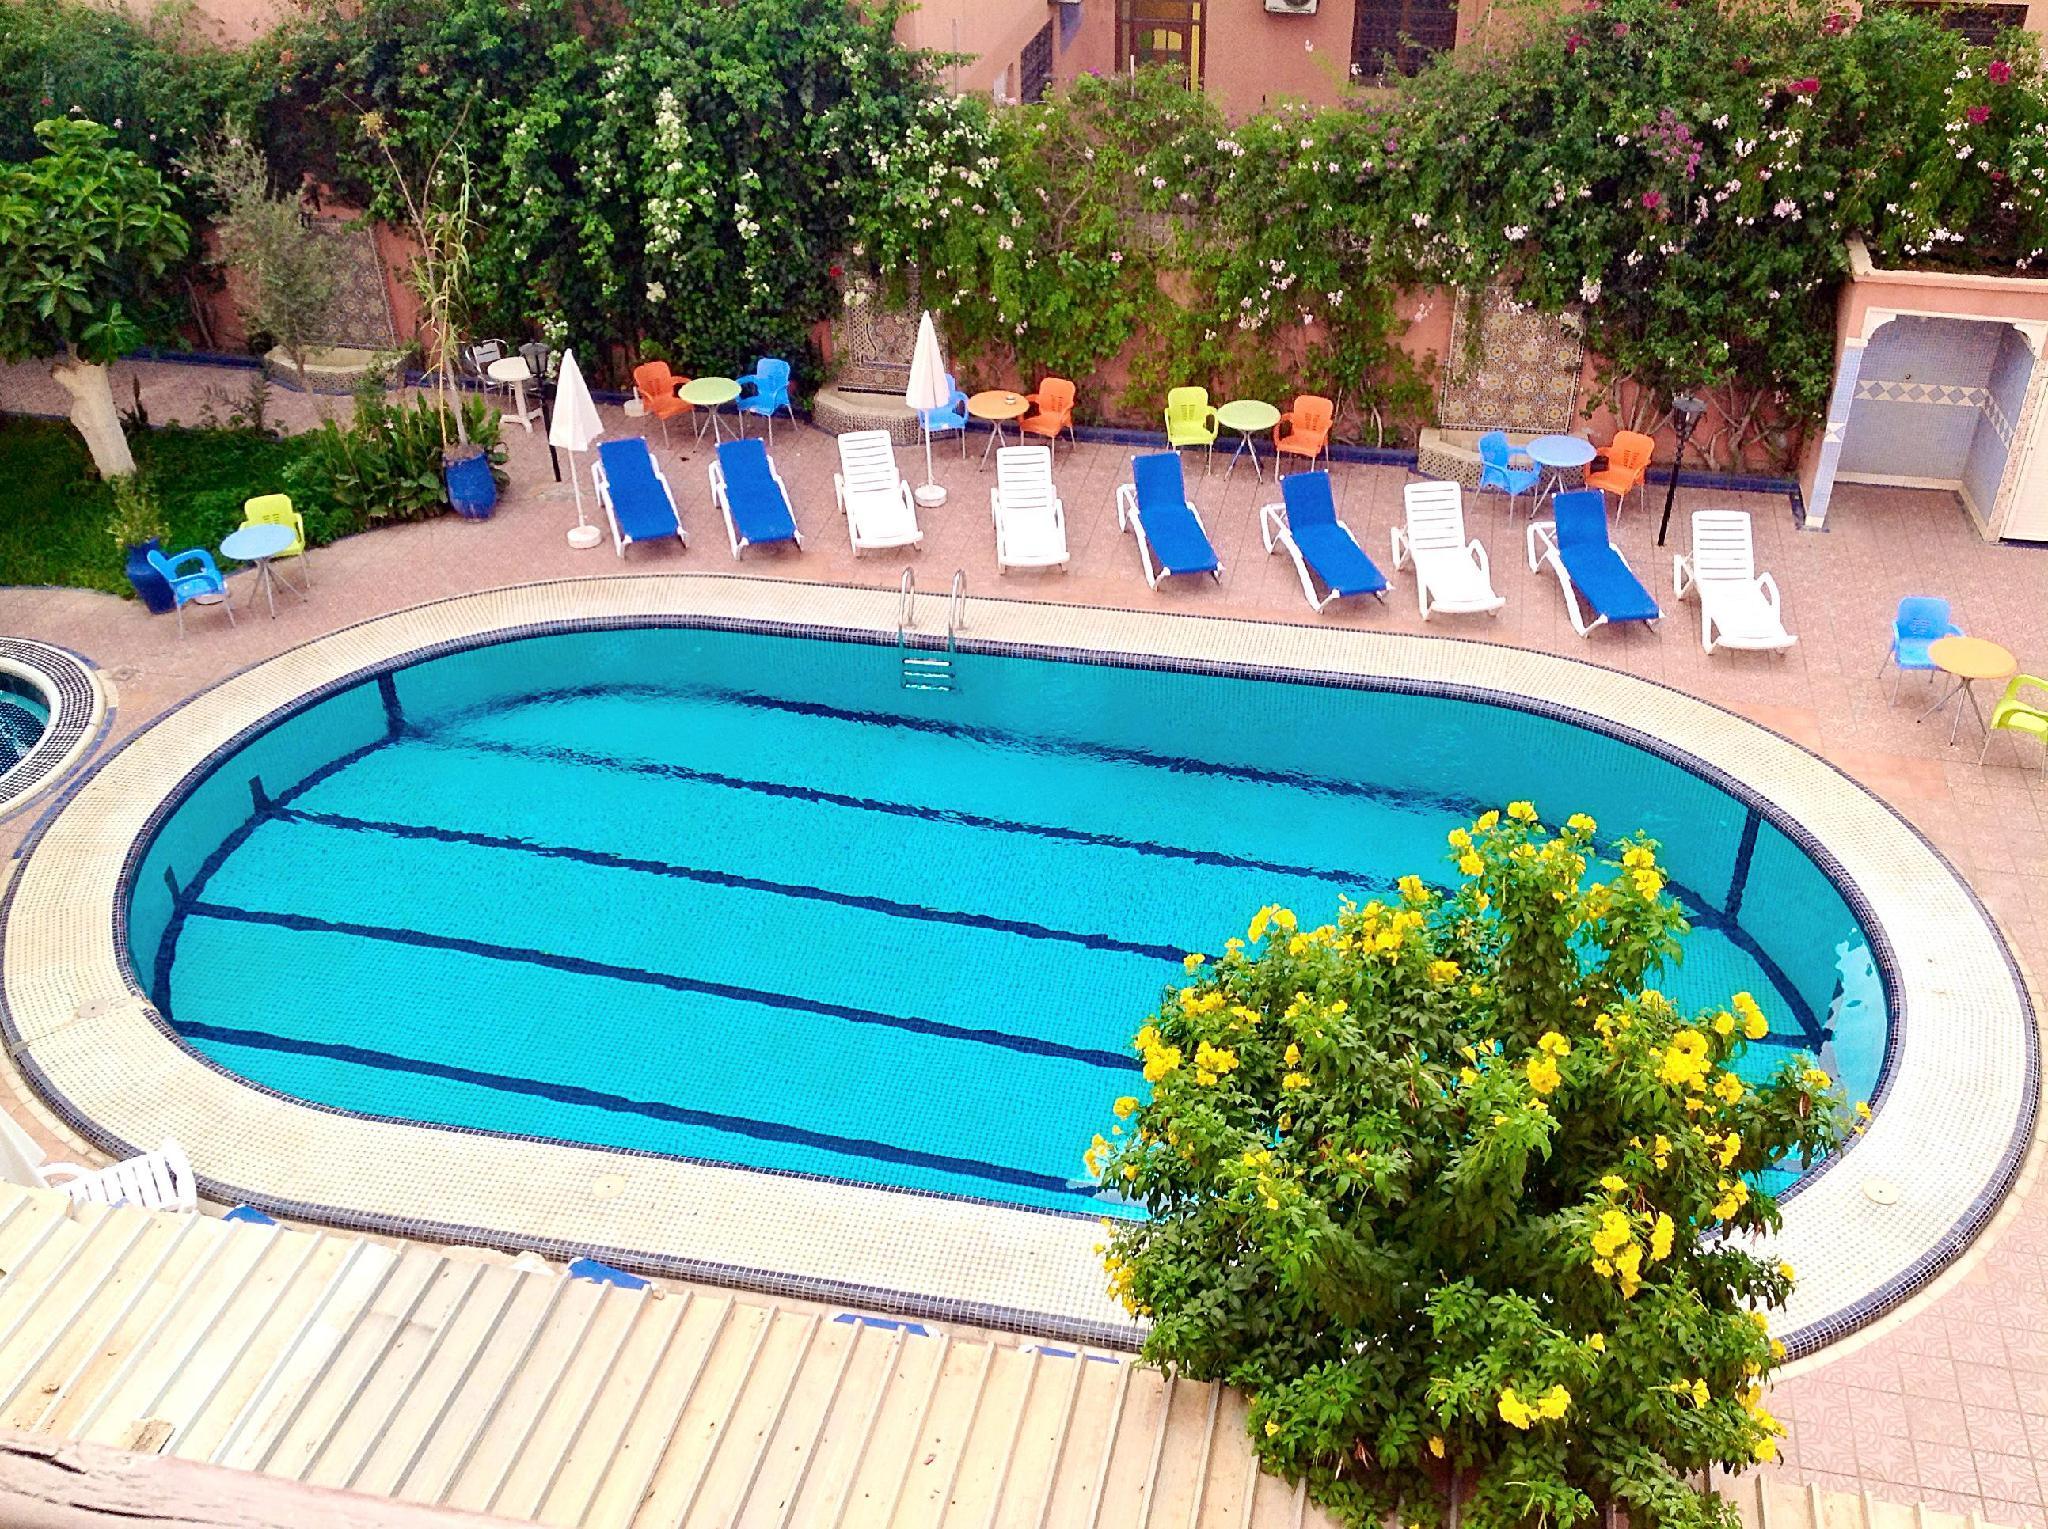 residence ezzahia marrakech morocco great discounted rates rh chiangdao com